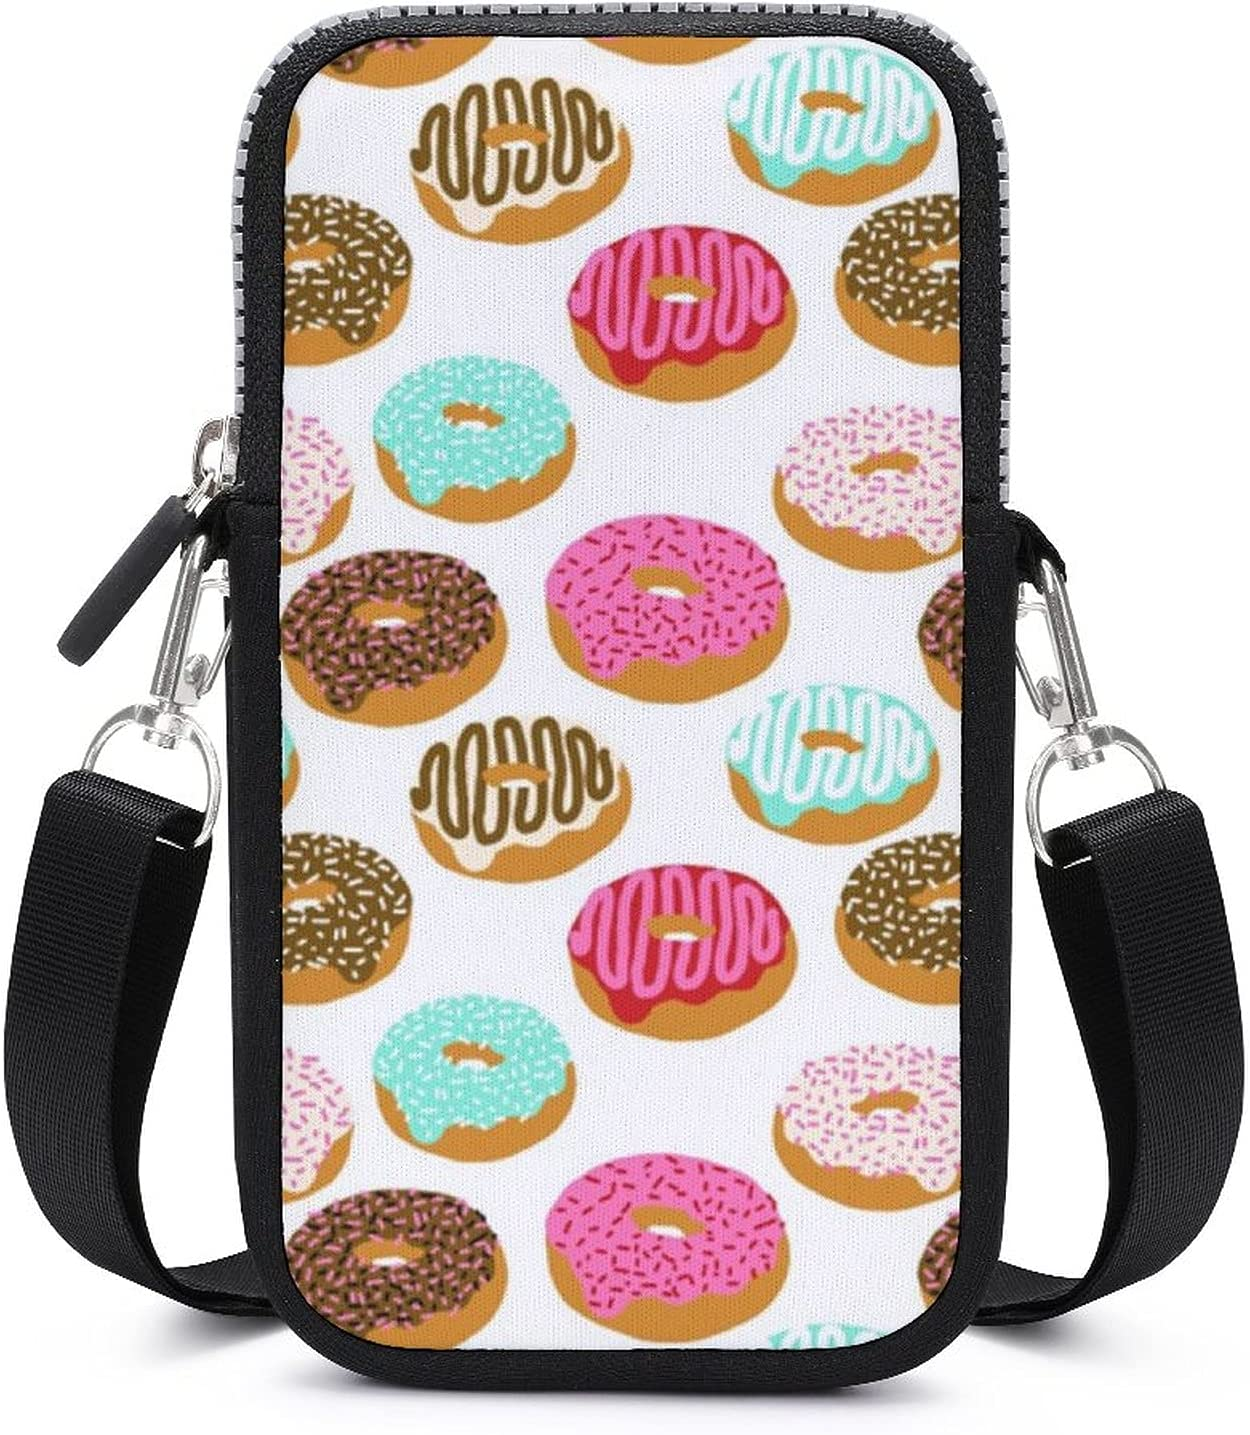 Cell Phone Excersise Multifunctional Holder - Passport, Credit Card Adjustable Shoulder Strap, Wristlets Bag Sweet Donut Wristlet Convertible Cross Body Bag